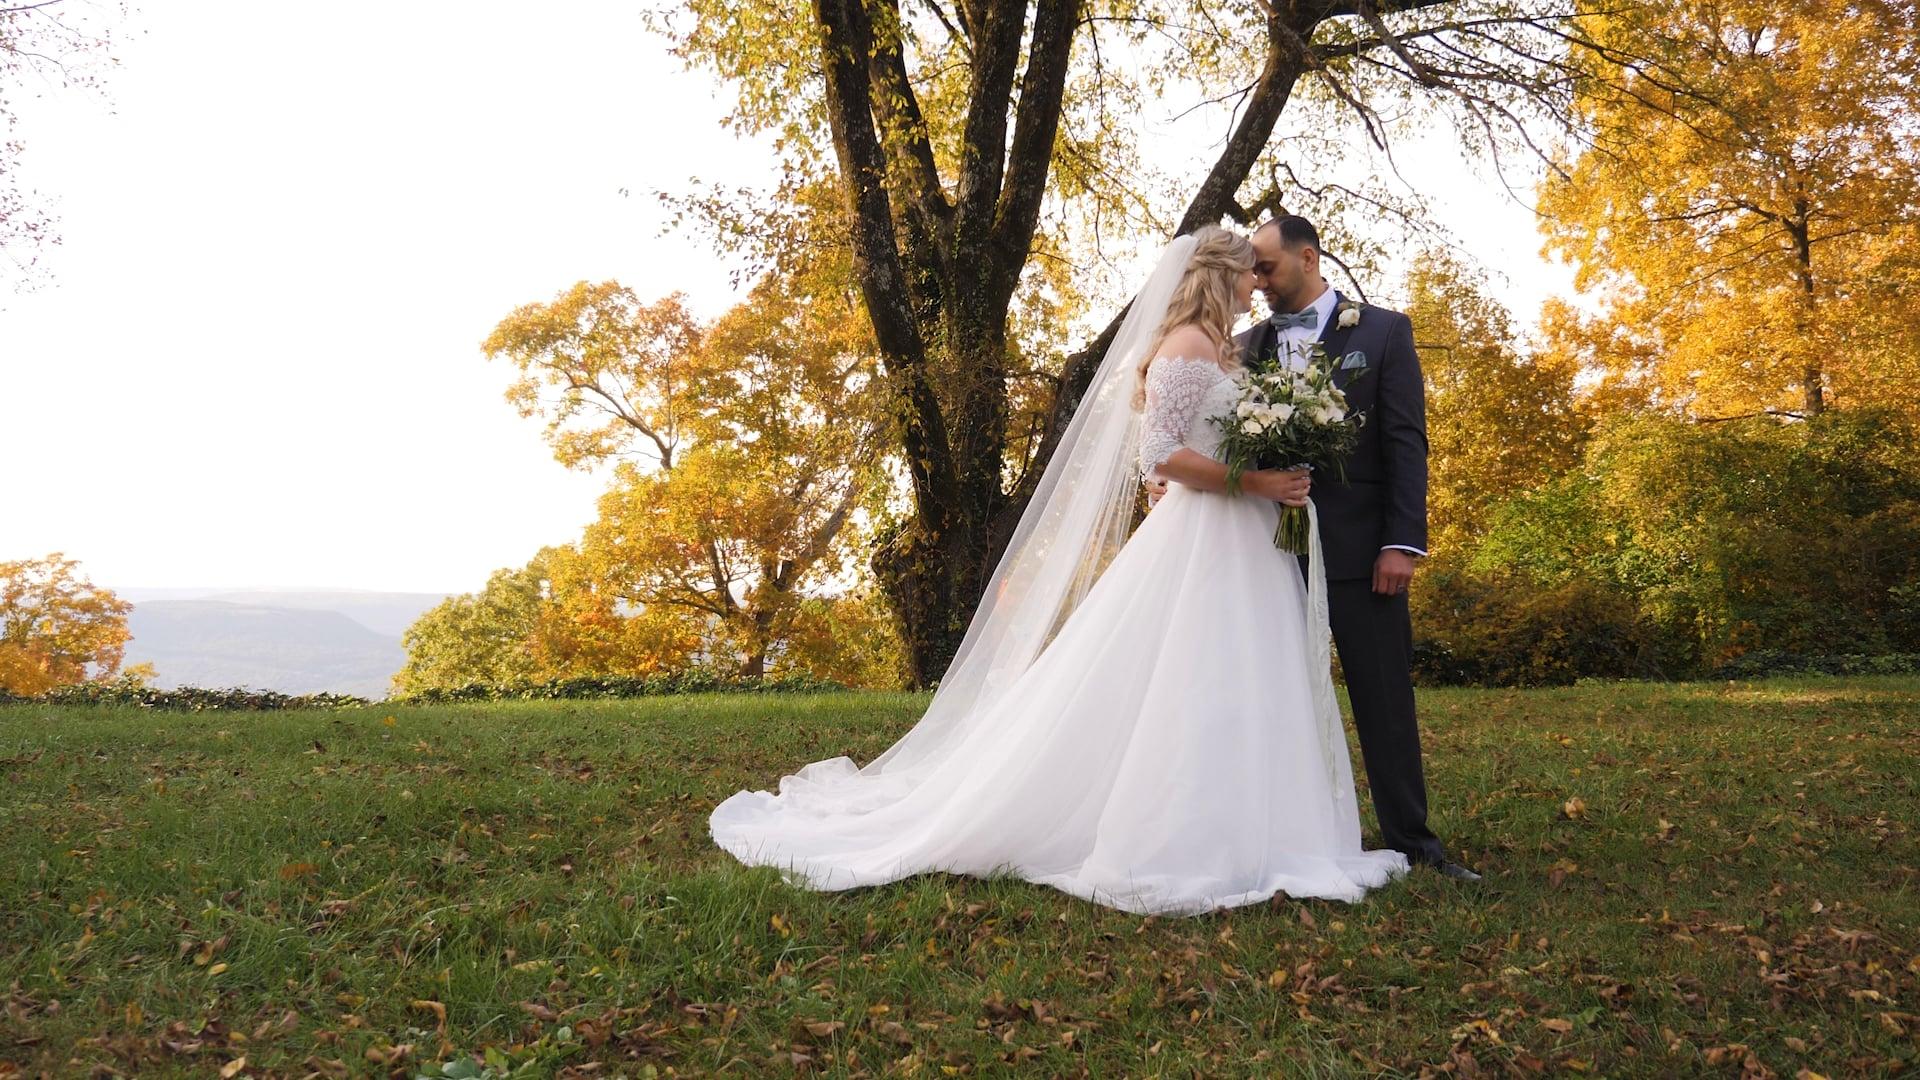 Martin & Laura Wedding Highlight   The Peyton, Chattanooga, TN